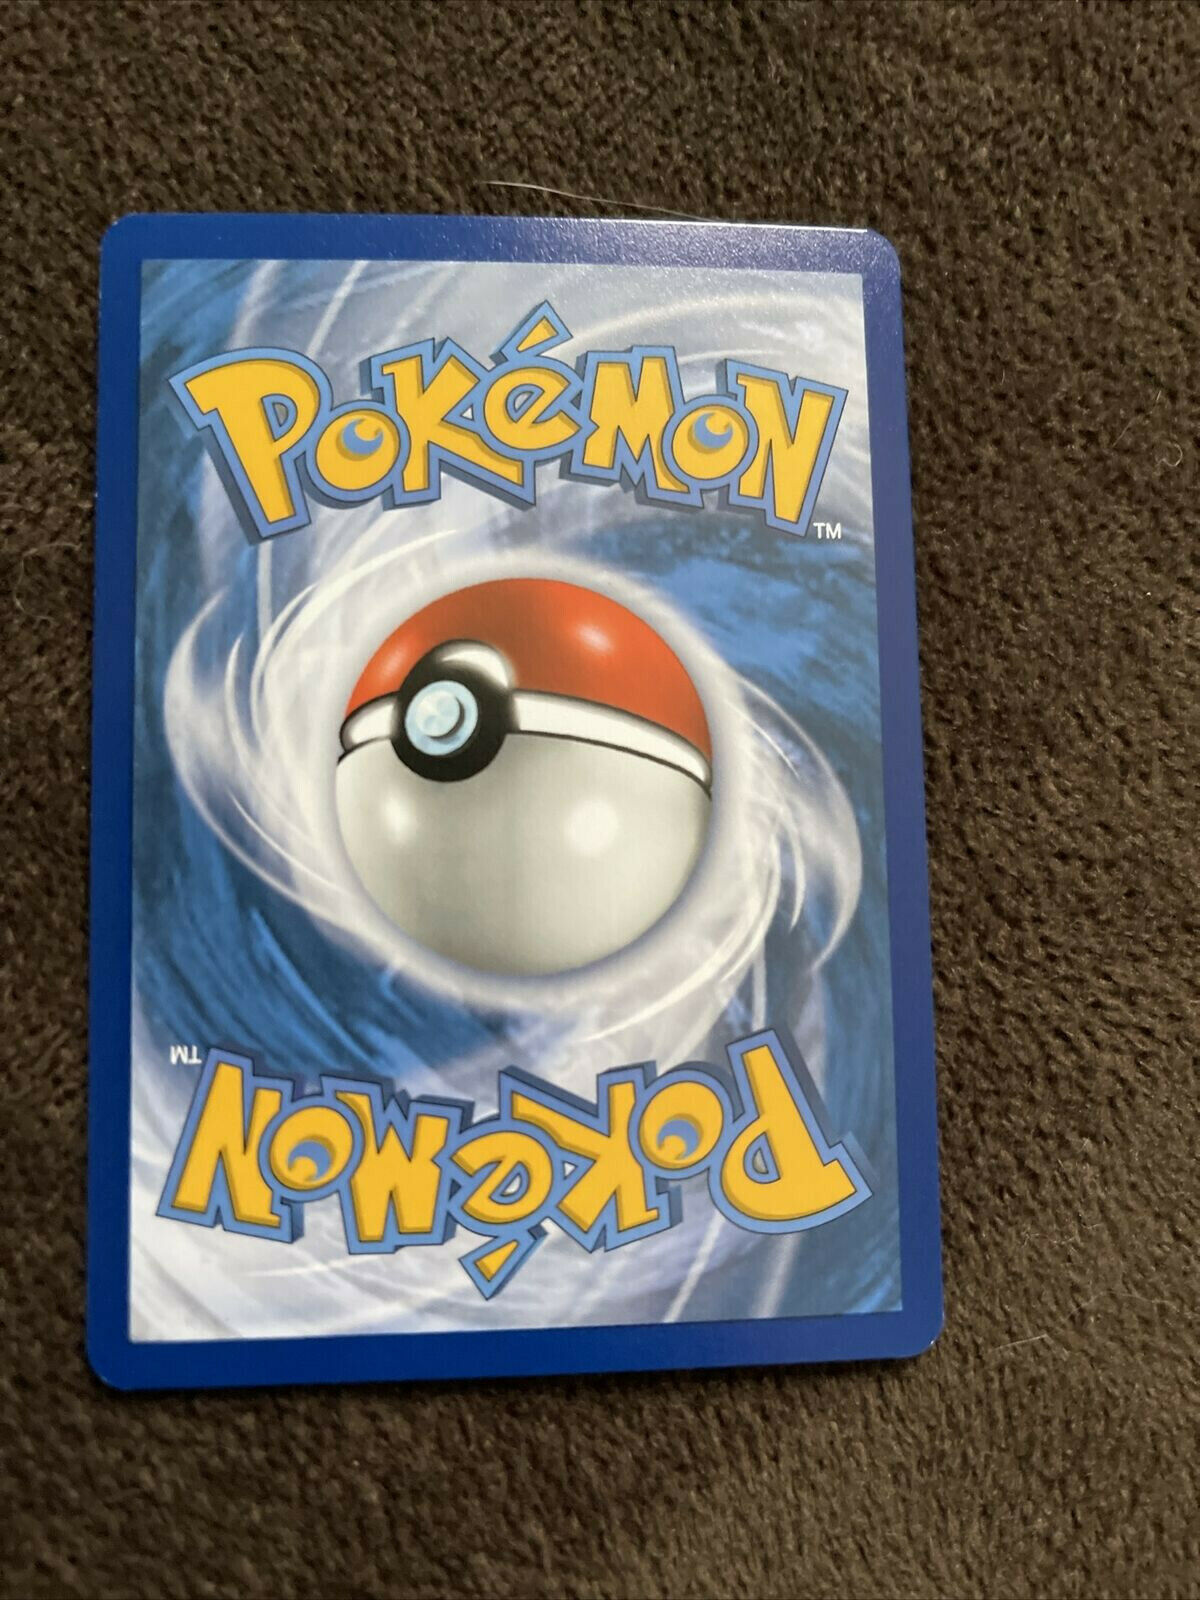 Pokemon Snivy Holo McDonald's 25th Anniversary Promo Card 2021 Mint 5/25 - Image 2